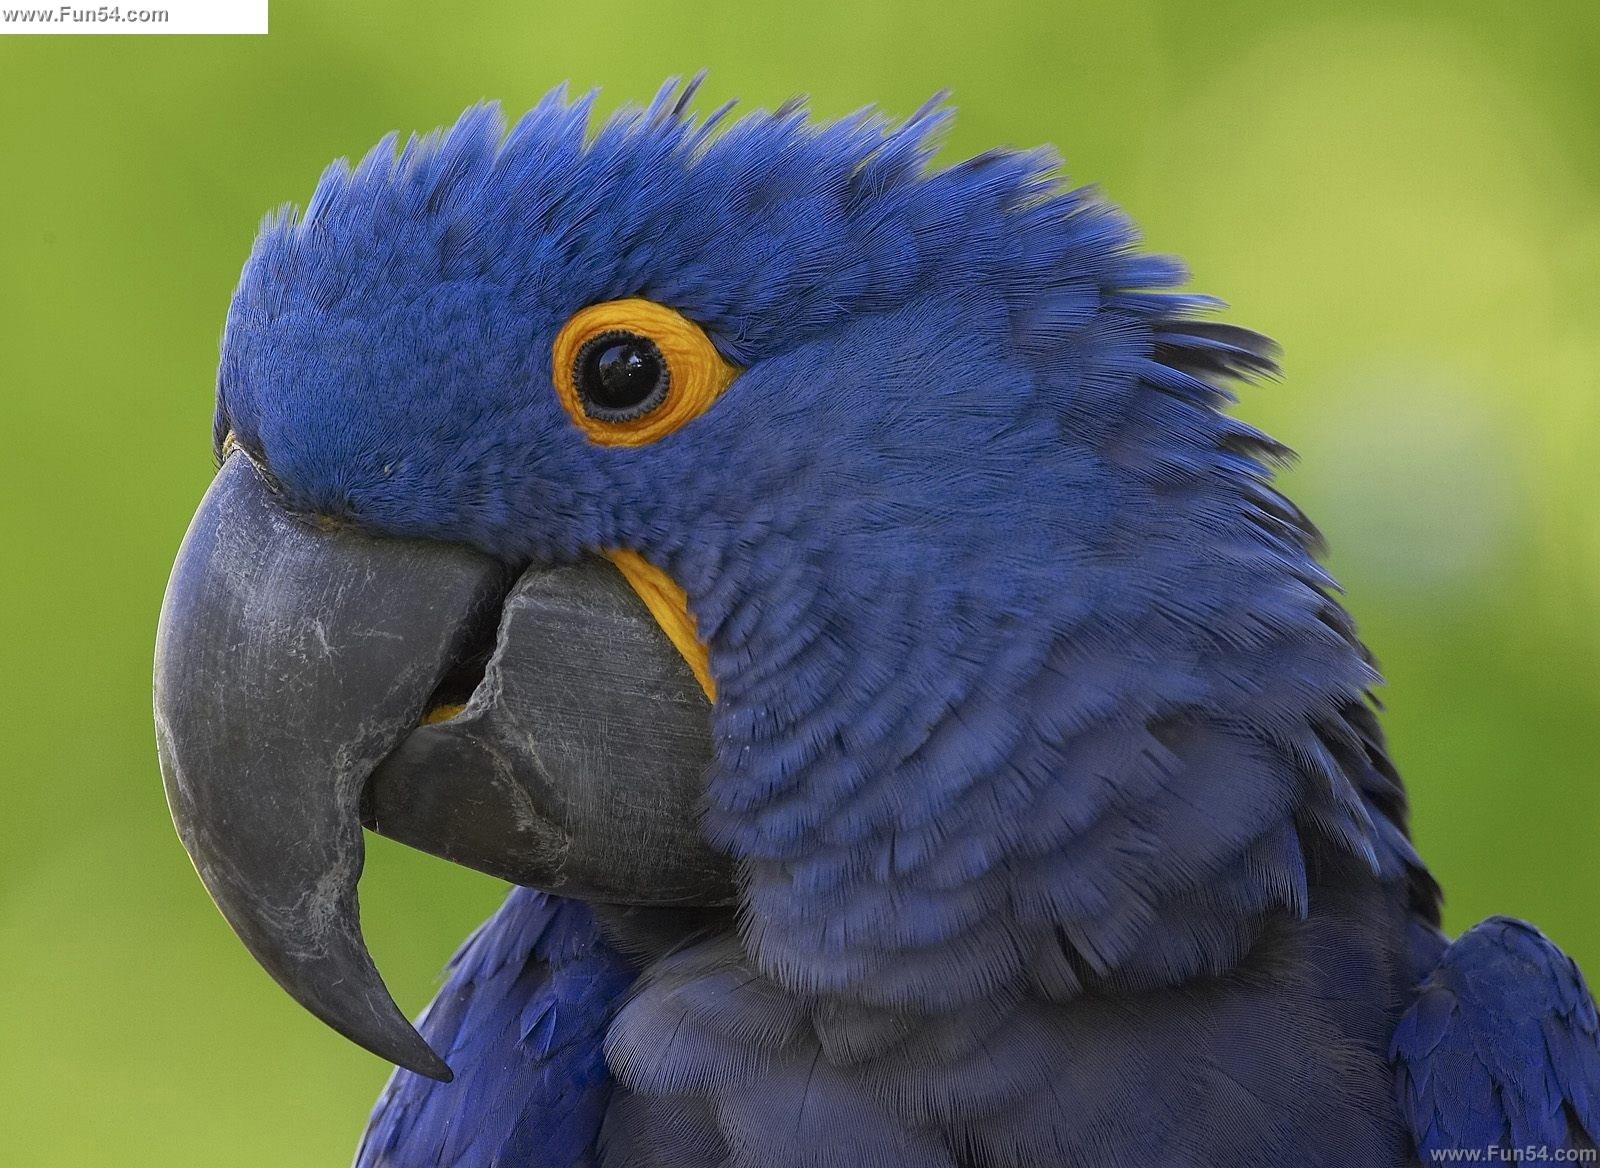 Cute Fat Cat Wallpaper Funny Blue Parrot Desktop Wallpaper Funny Animal